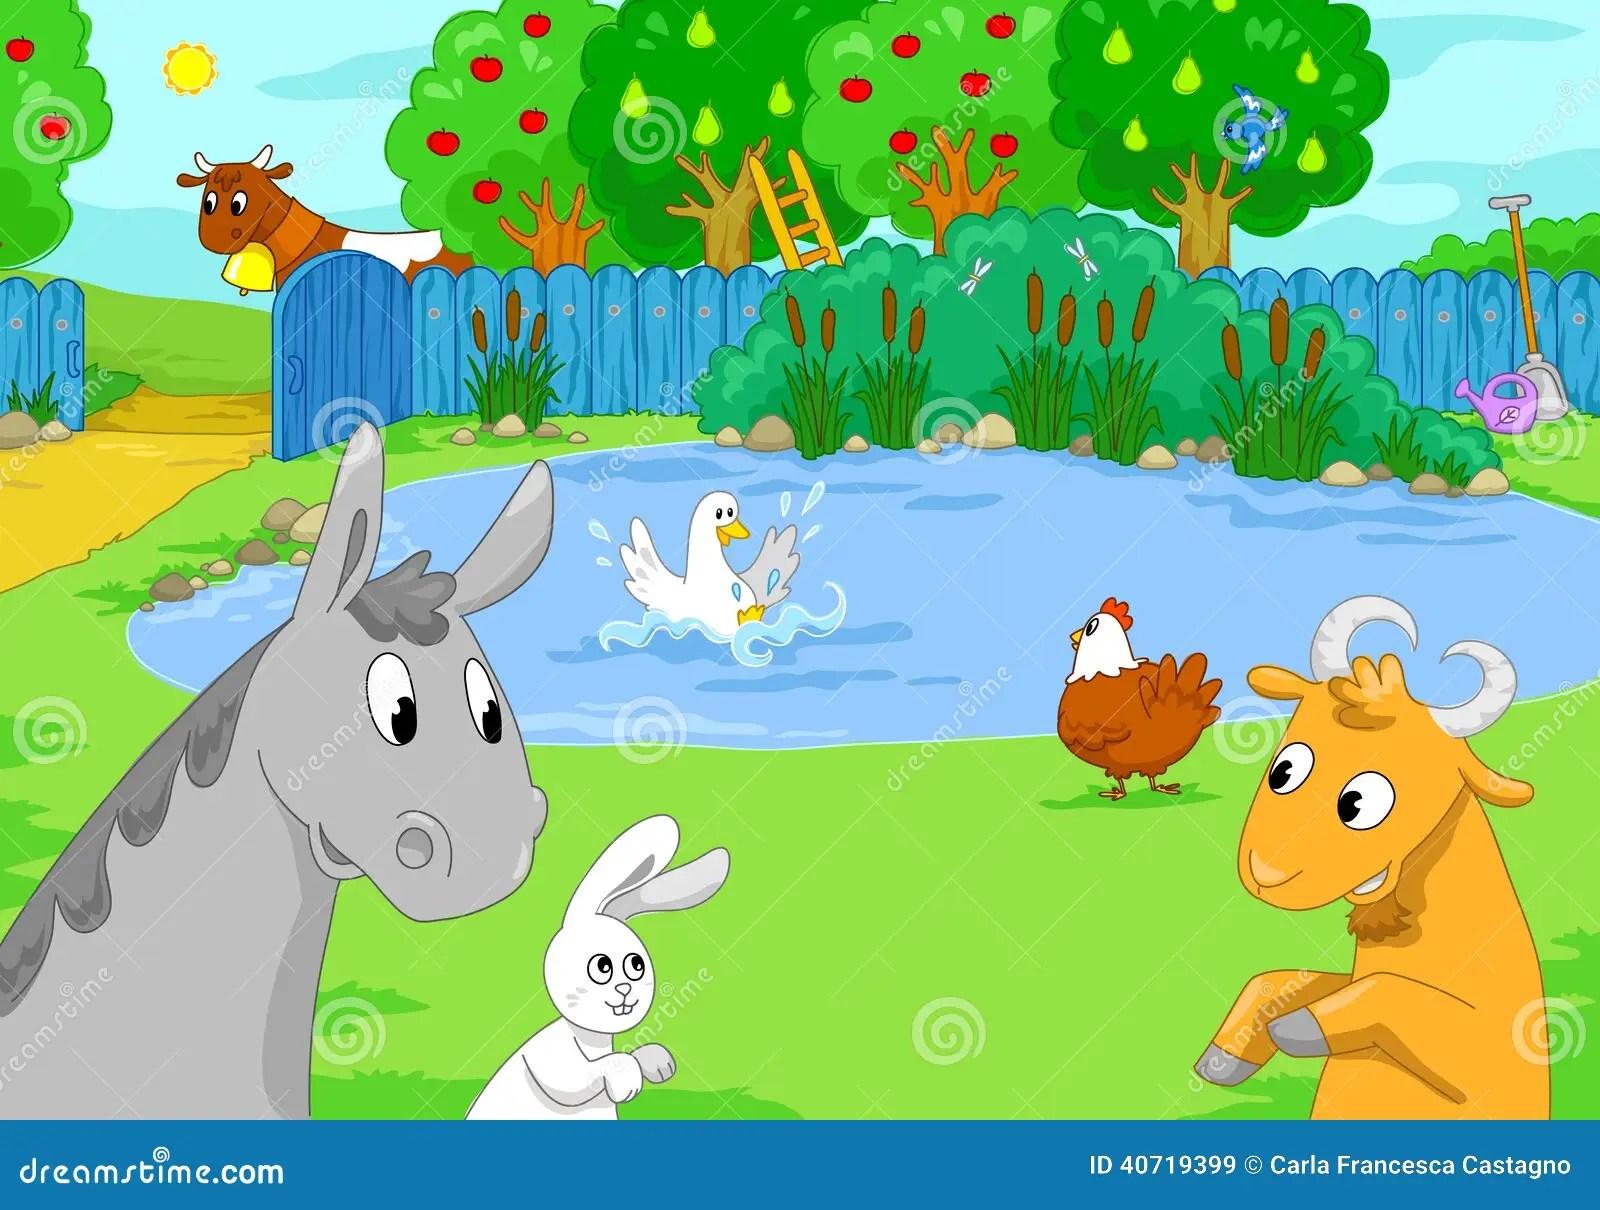 Cute Ducks In Water Wallpaper Farm Animals At The Lake Children Illustration Stock